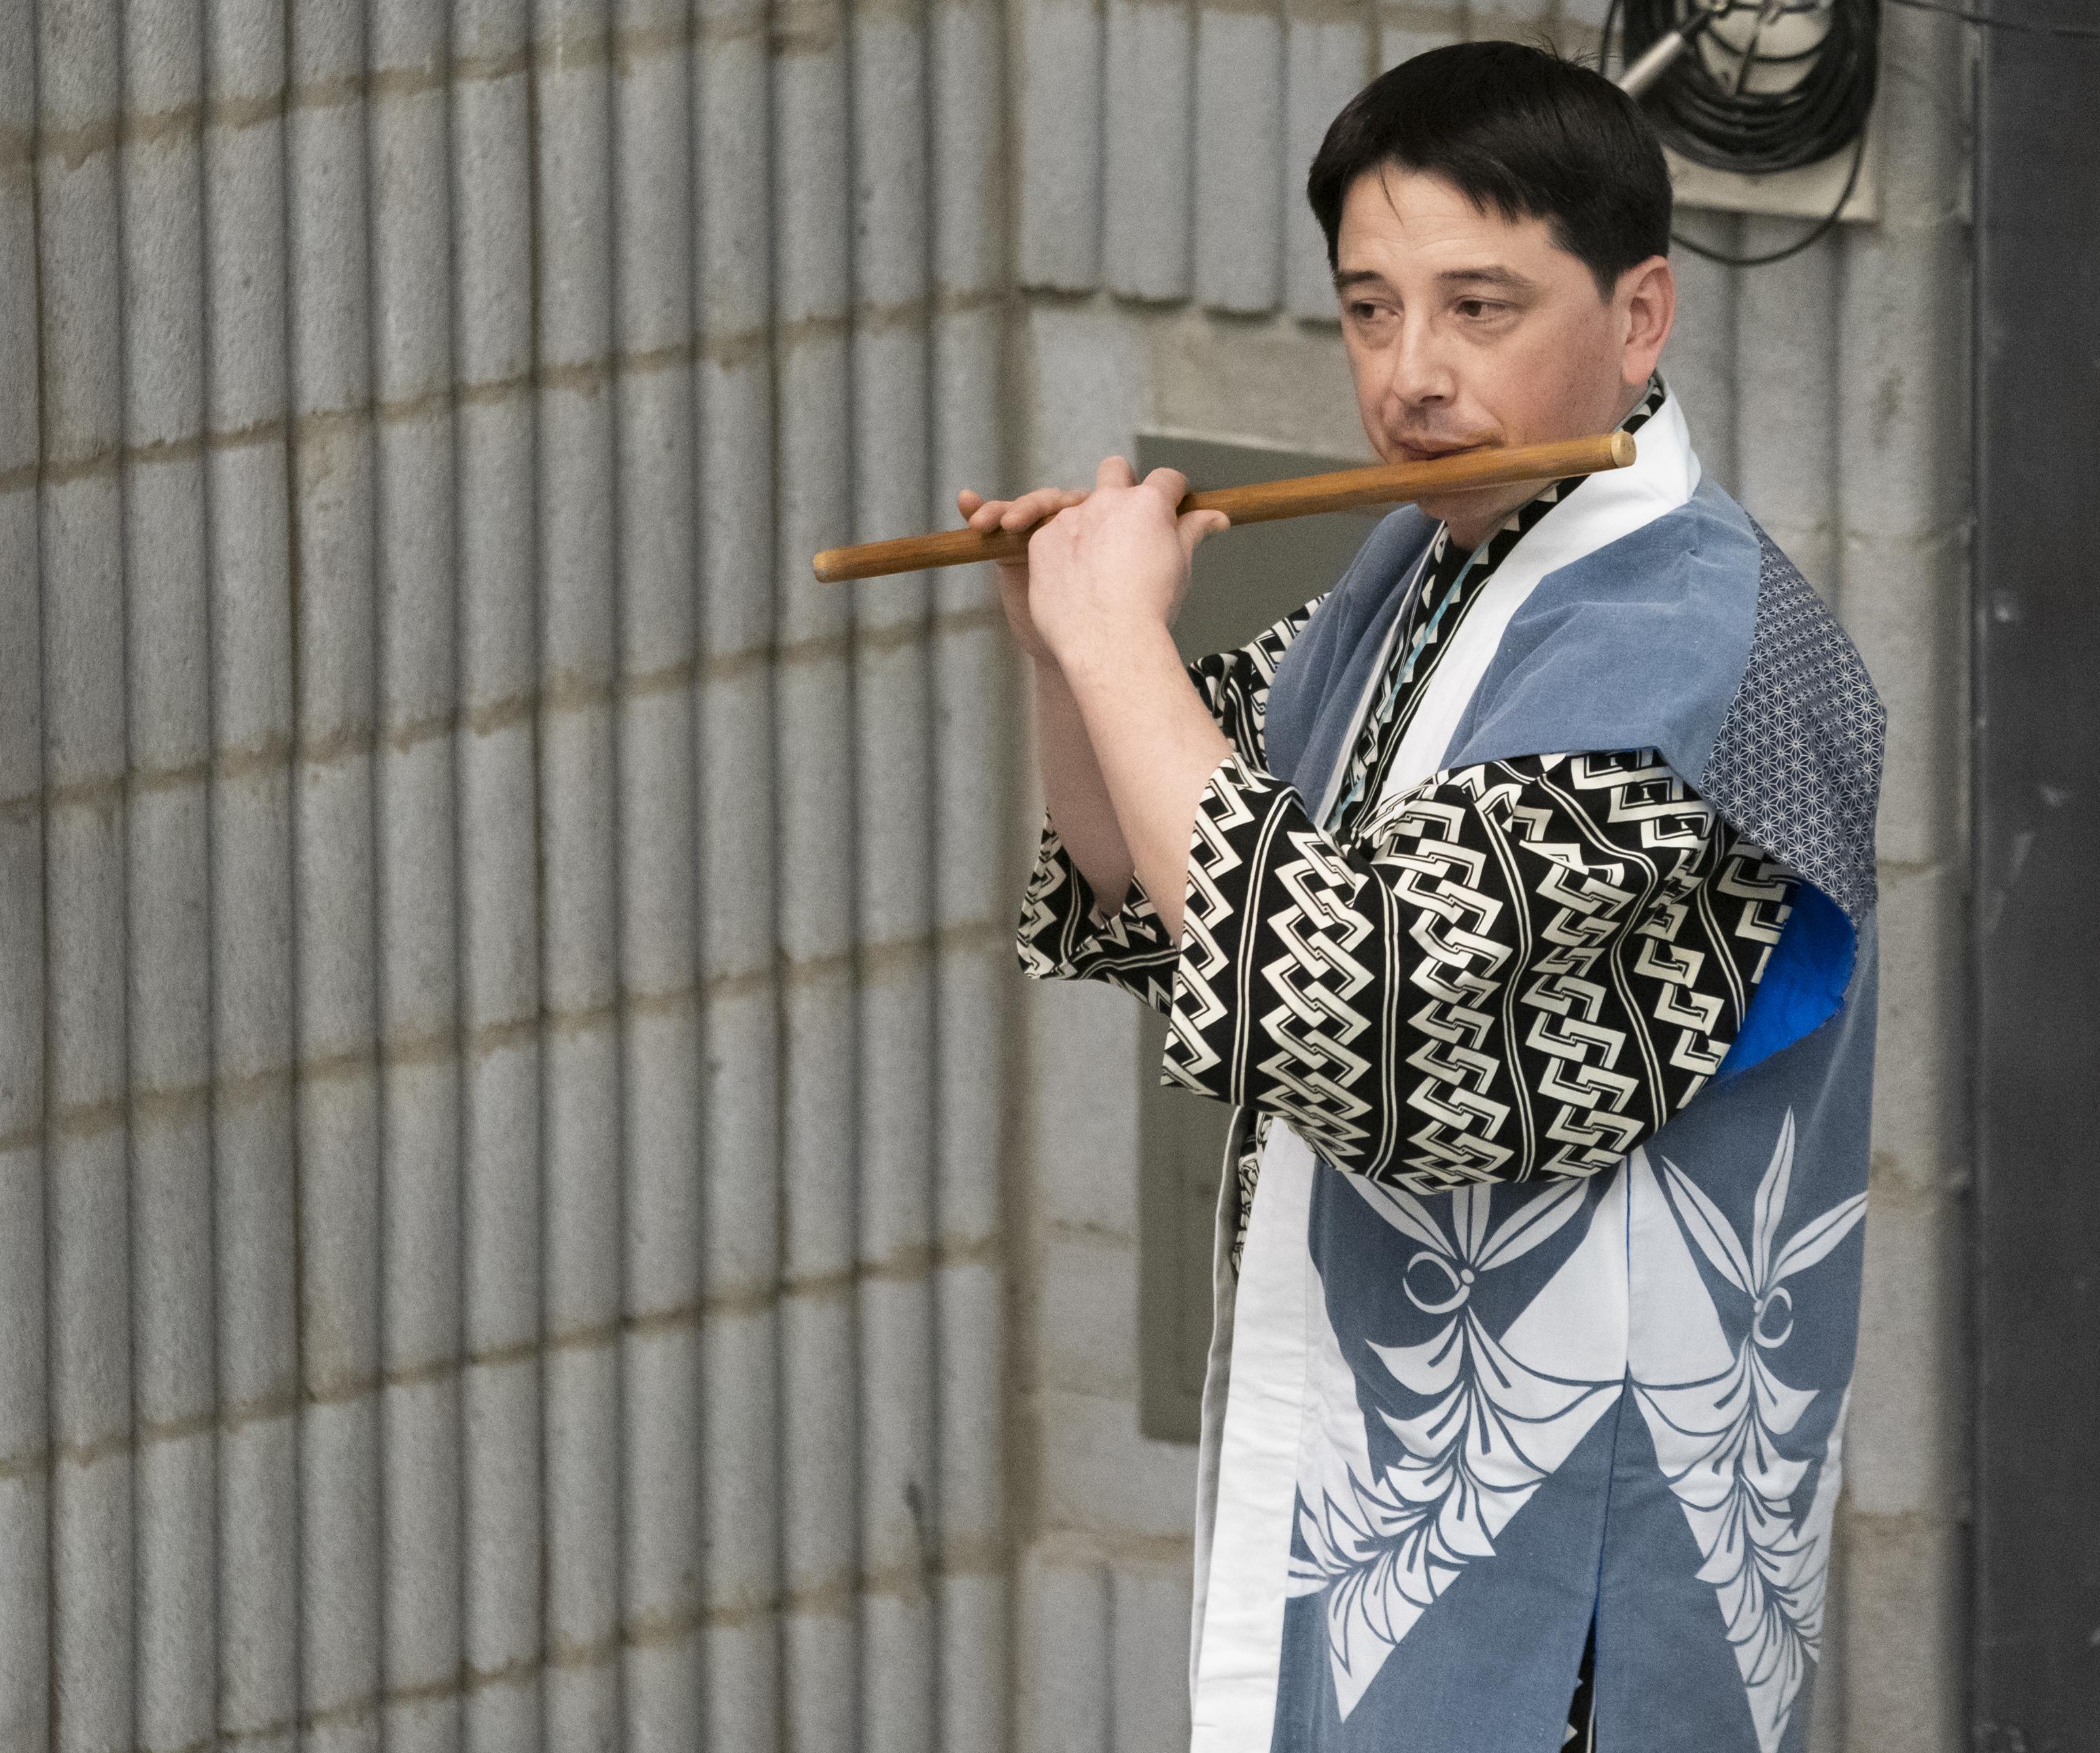 Kokichi Kusano